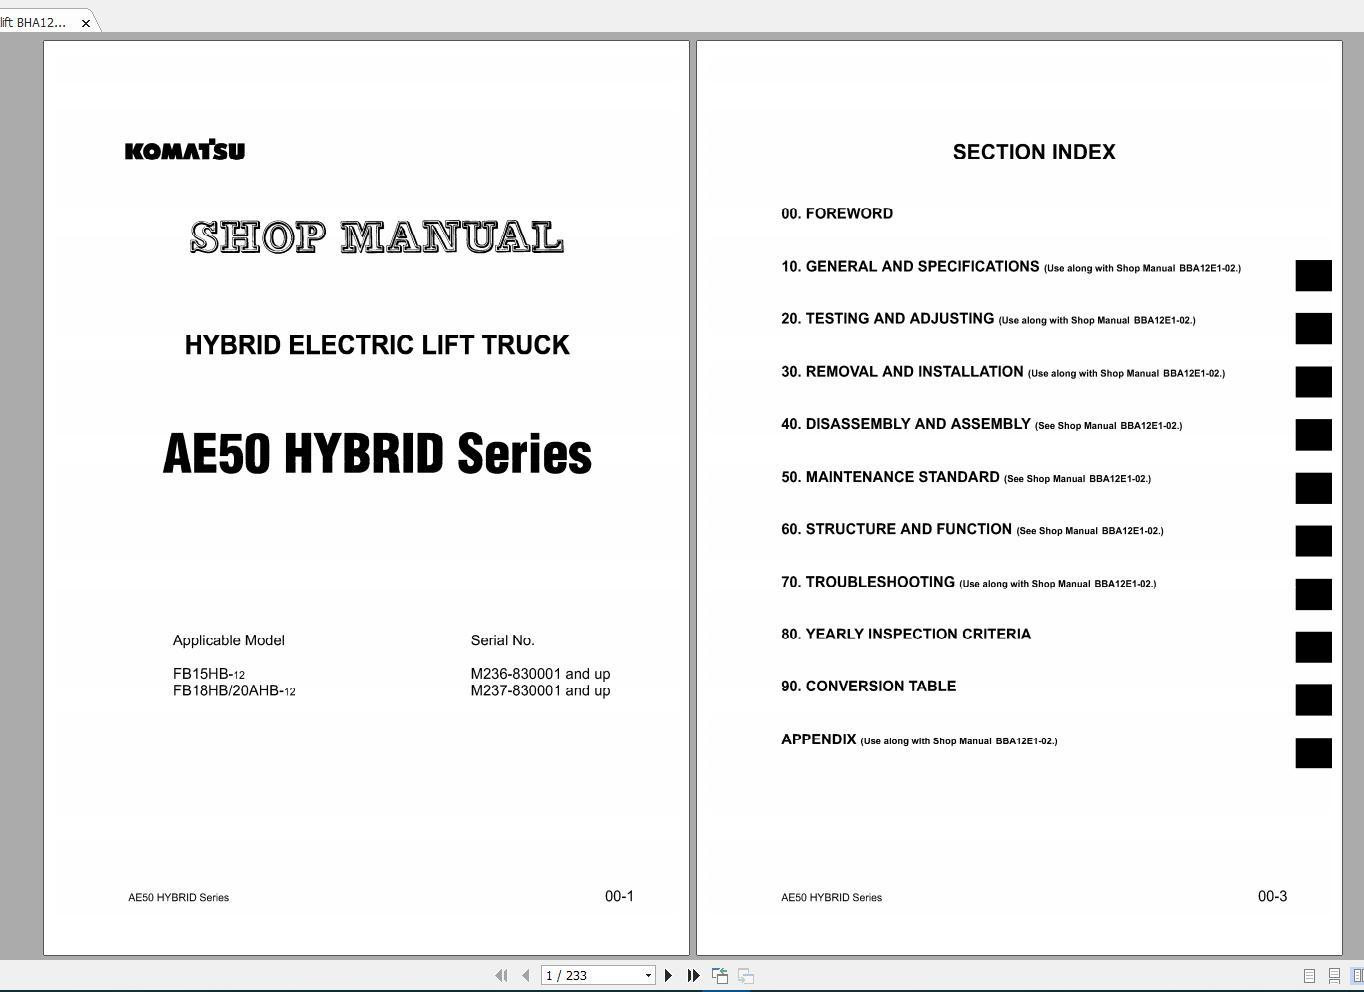 Komatsu_Forklift_Service_Manual_PDF_DVD8